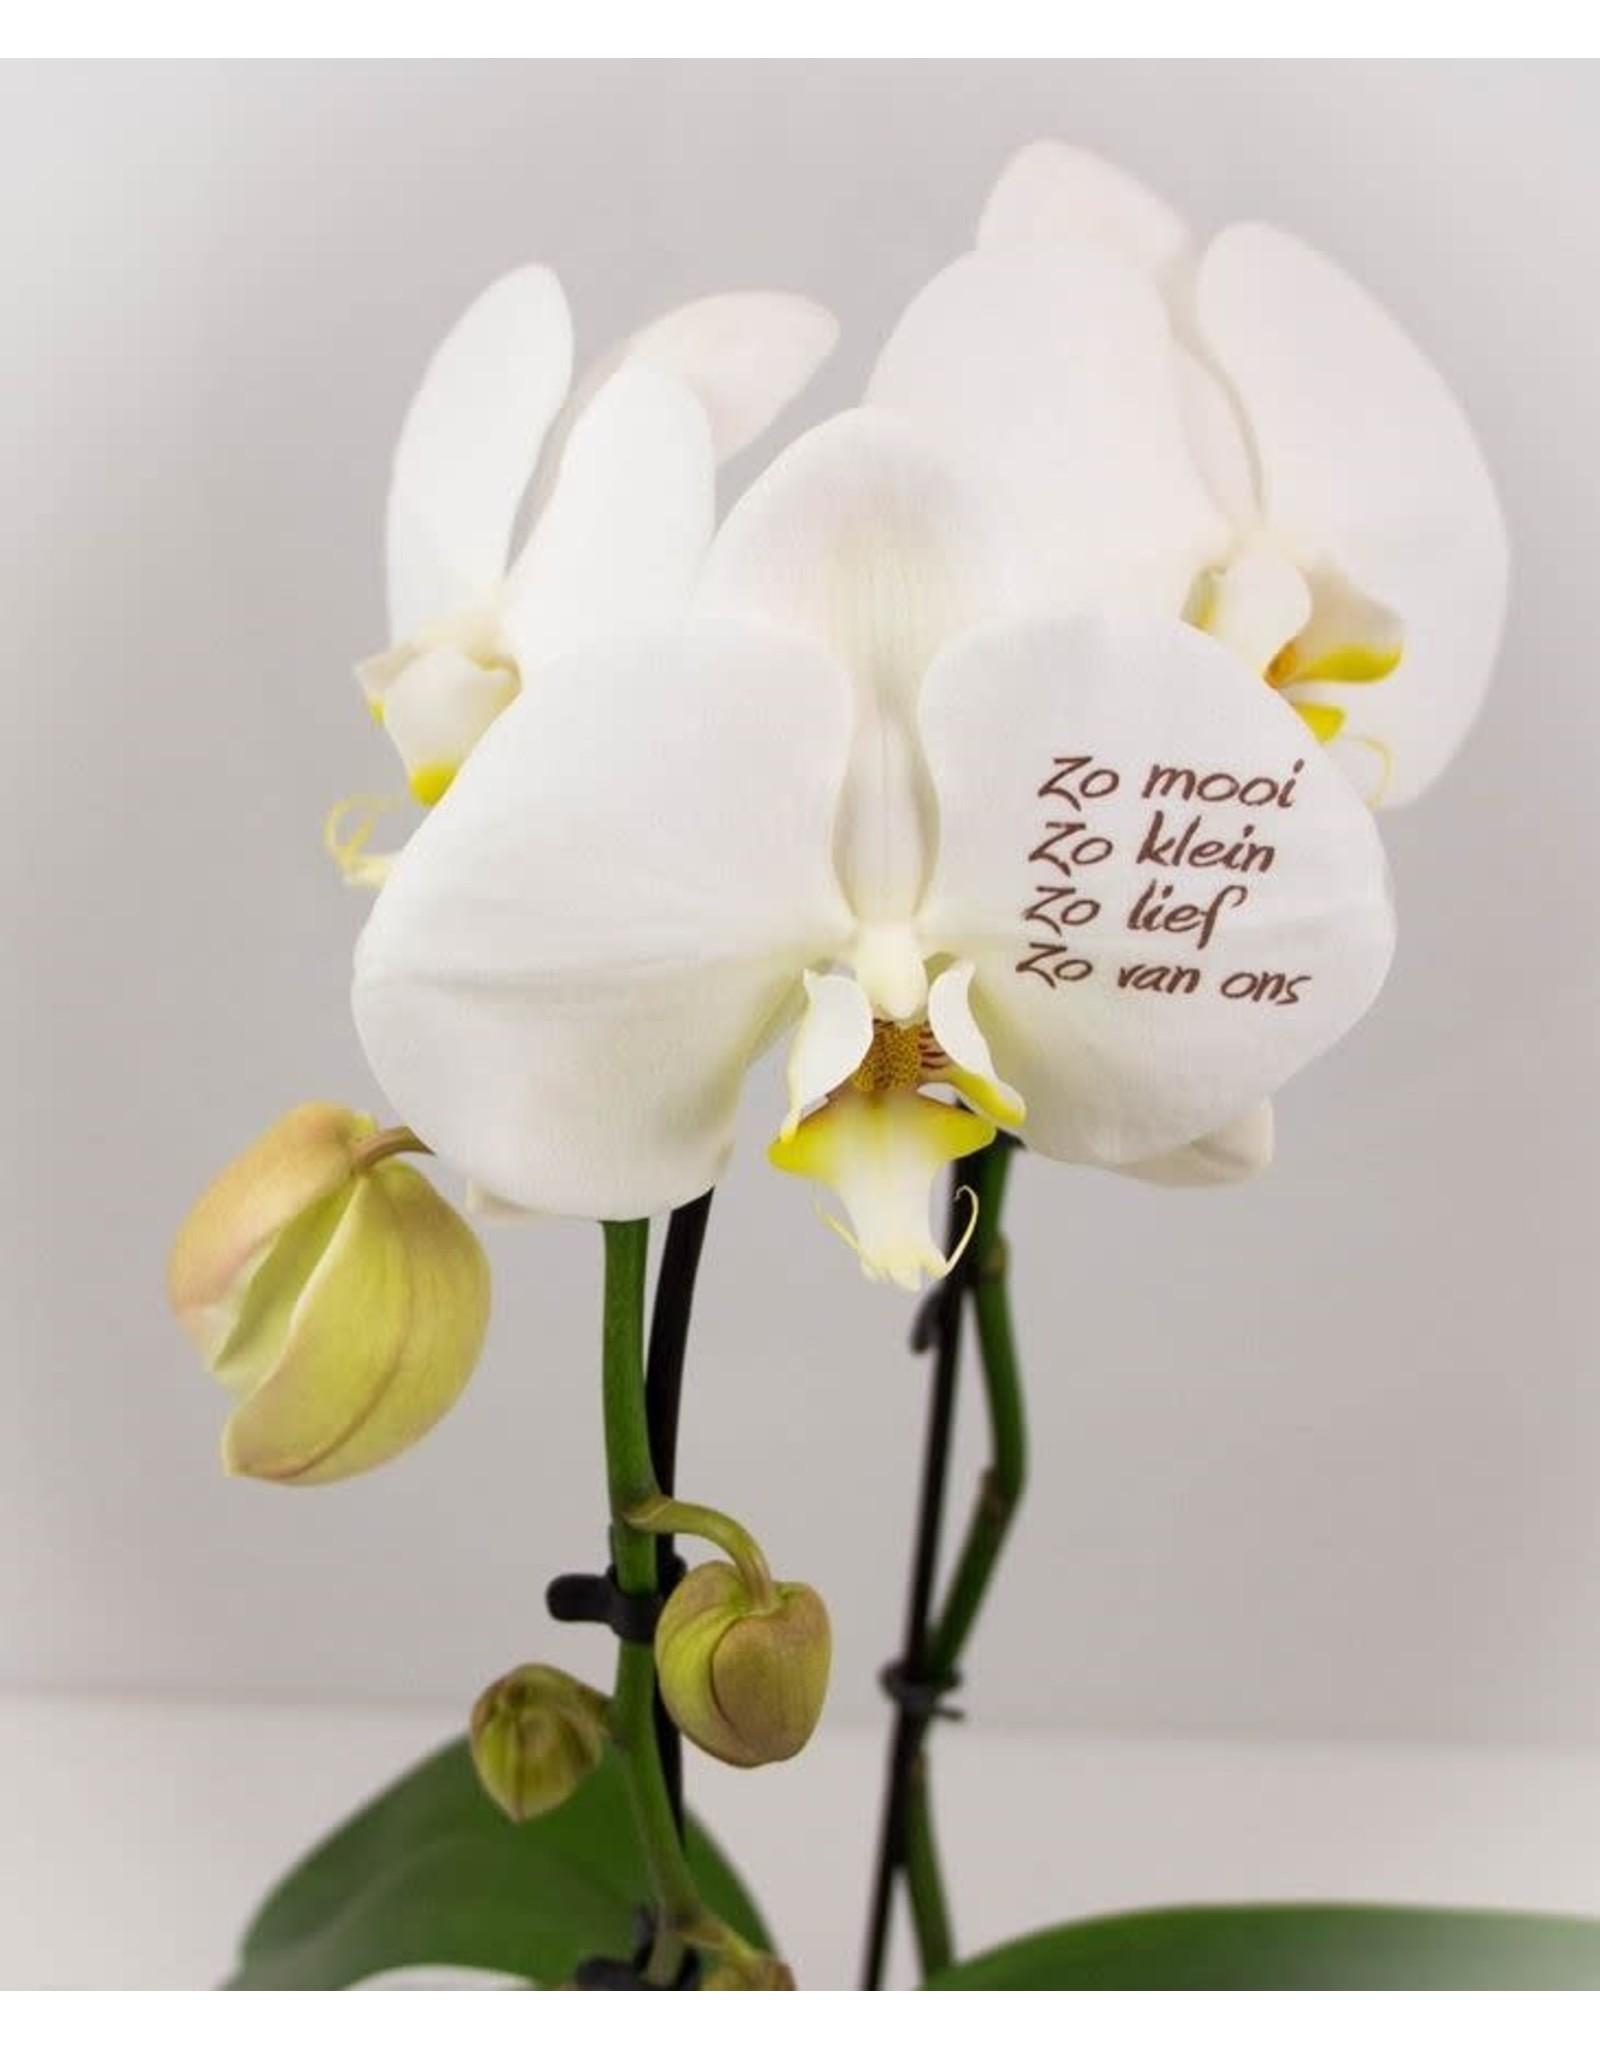 Orchidee - zo mooi, zo klein